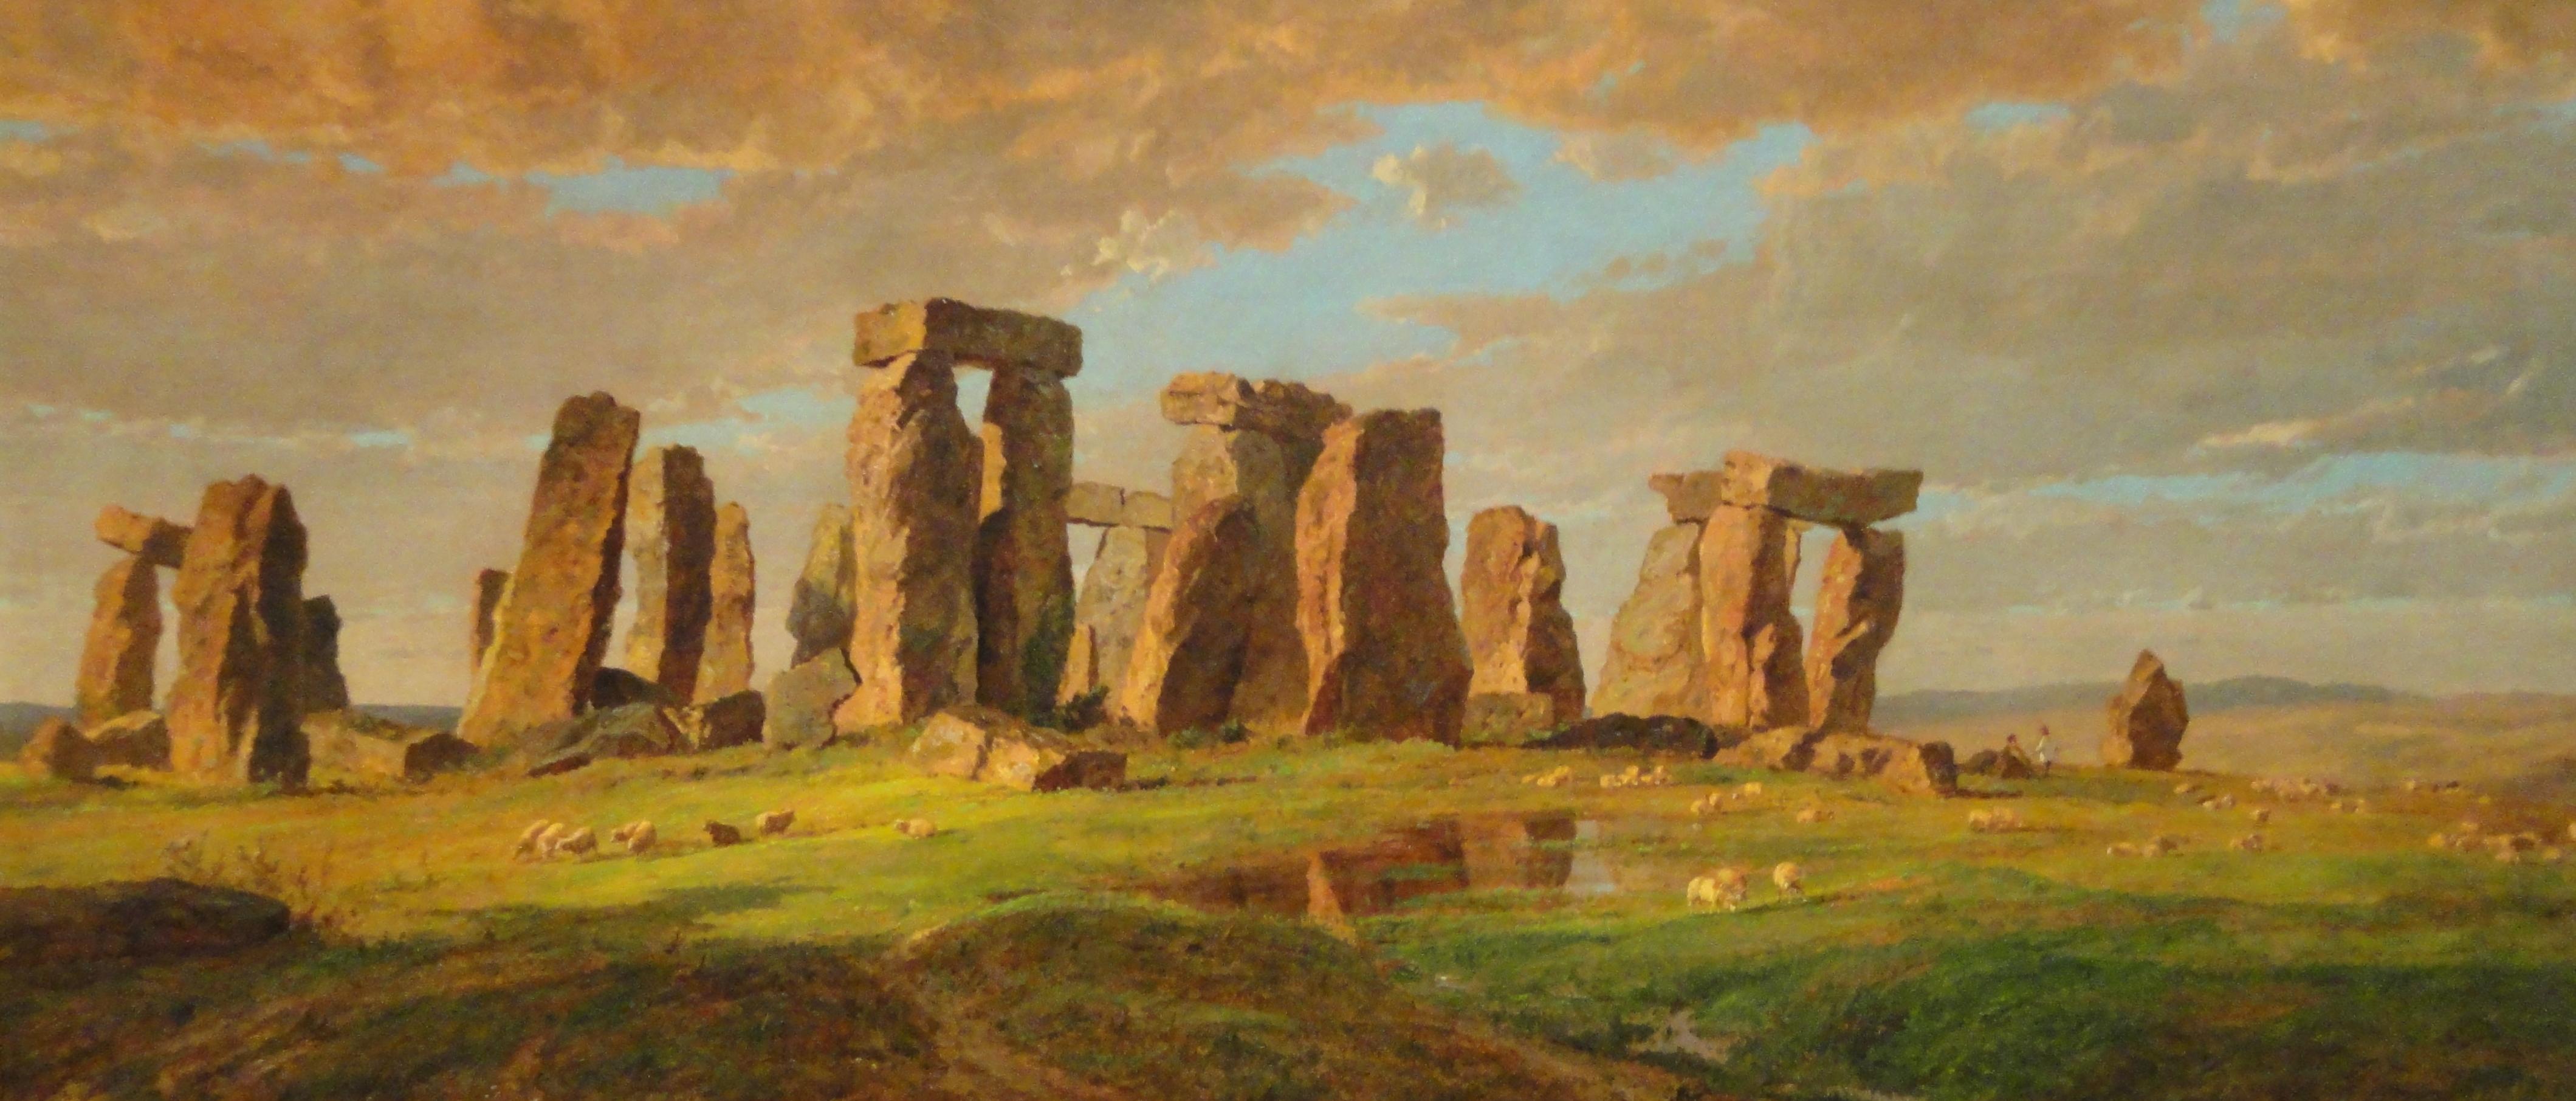 File:Stonehenge by Jasper Francis Cropsey, 1876 - Nelson-Atkins ...